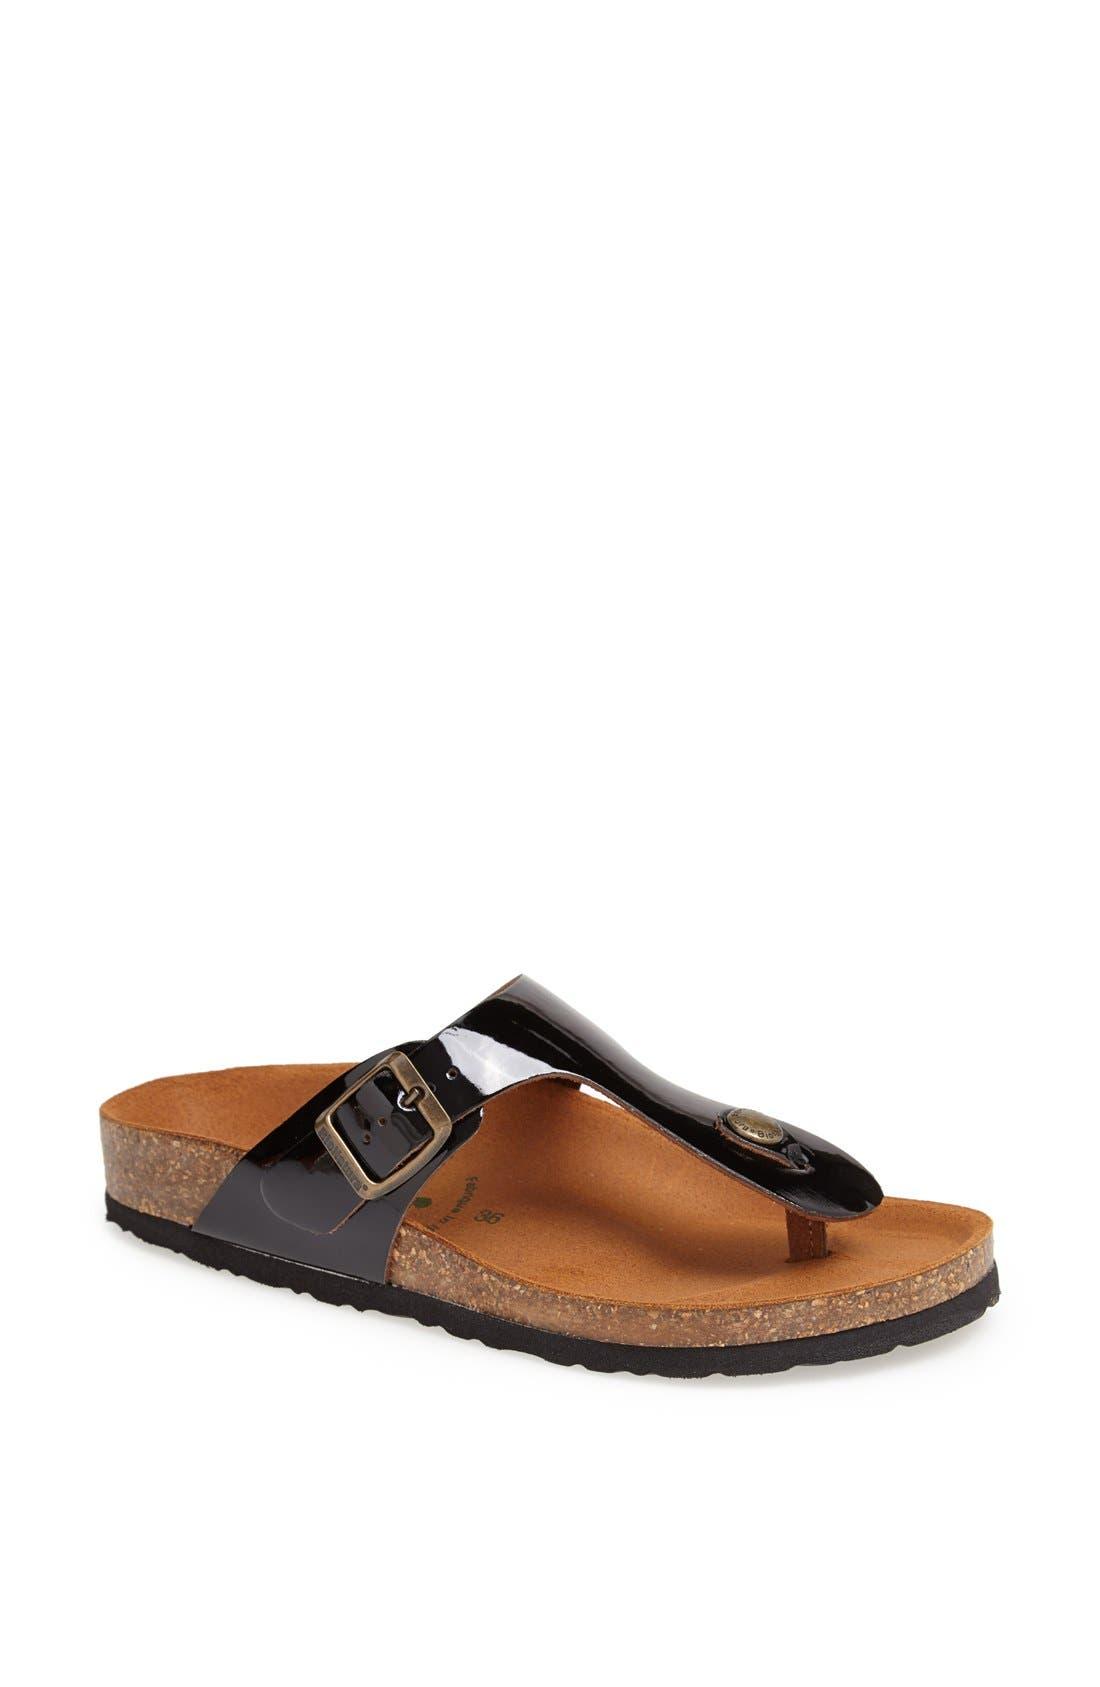 Main Image - BioNatura 'Finger' Thong Sandal